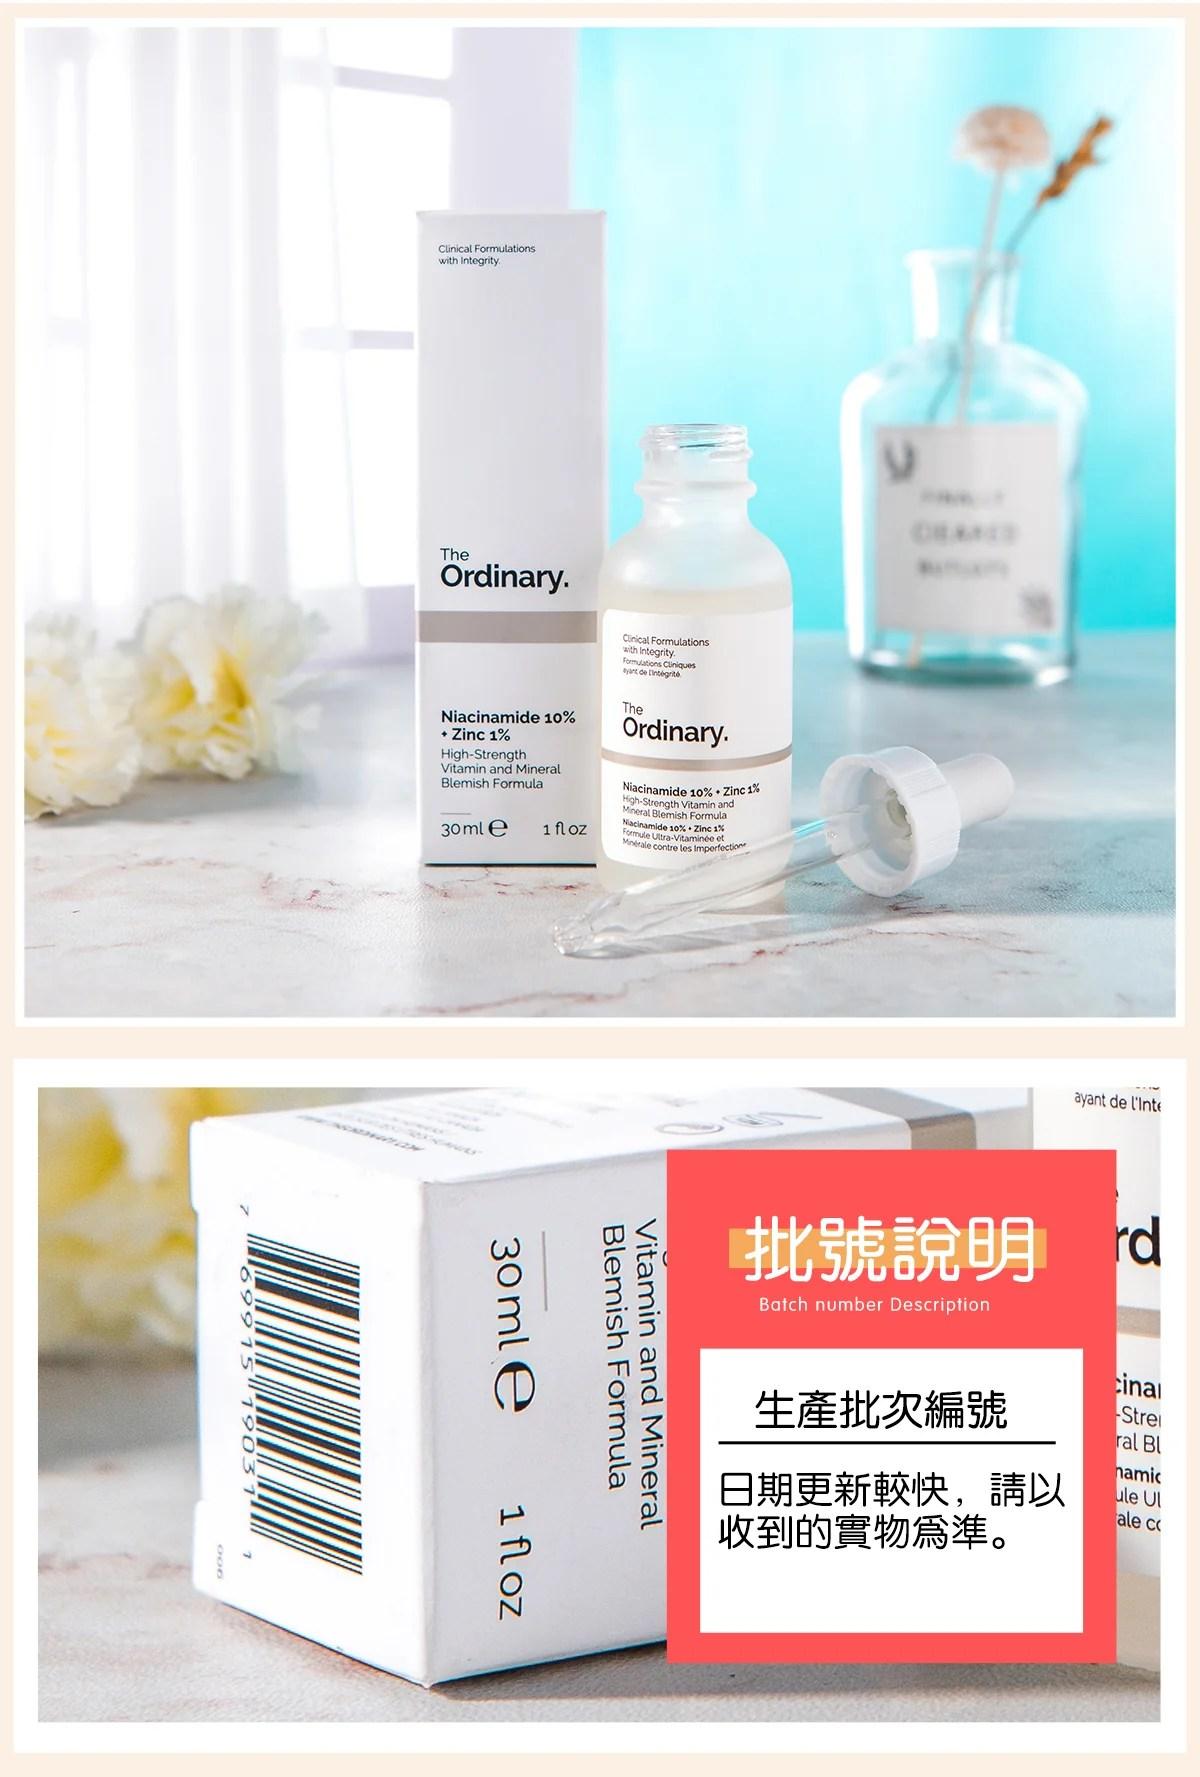 The Ordinary 10%煙酰胺+ 1%鋅 去印收毛孔精華液 30ml   AbuCare Limited